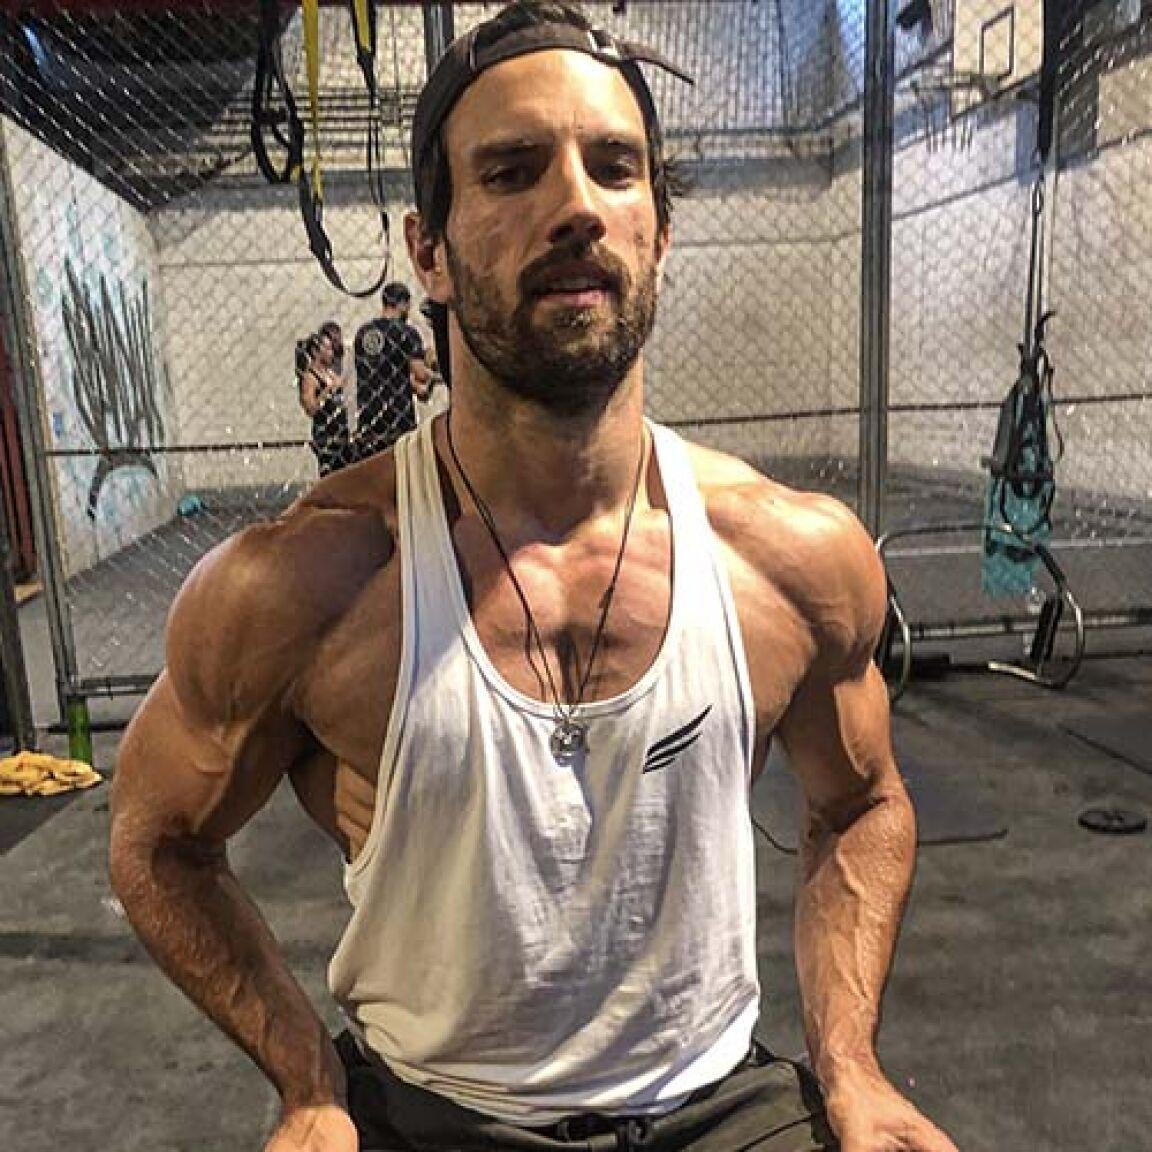 Volumen Fitness